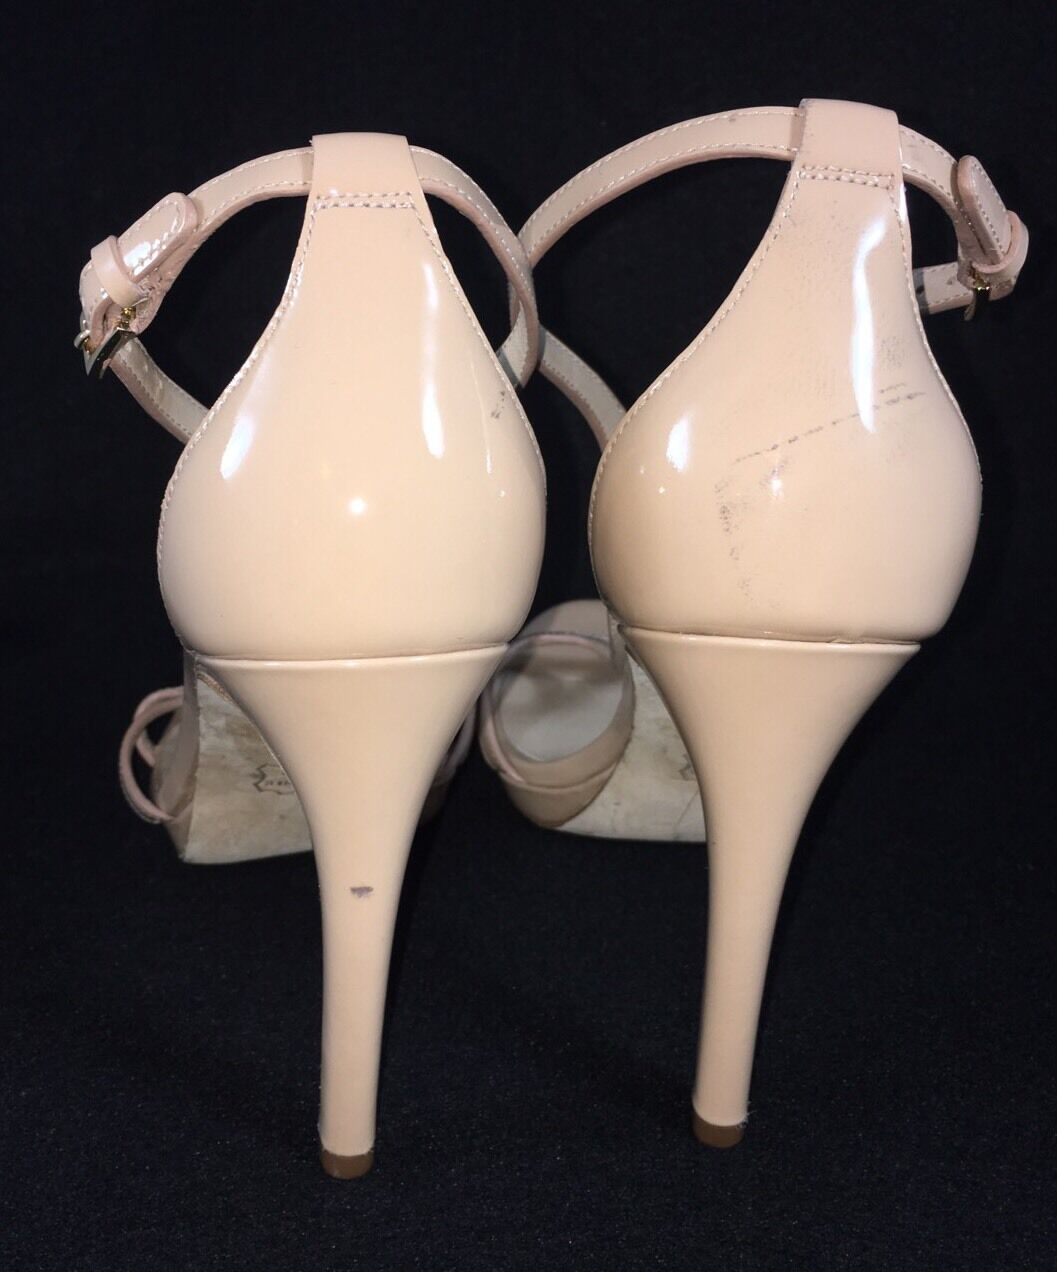 Tory Burch Shelley Nude Dusty rose Patent Leather Platform Heel Heel Heel Strappy Sandal 938009